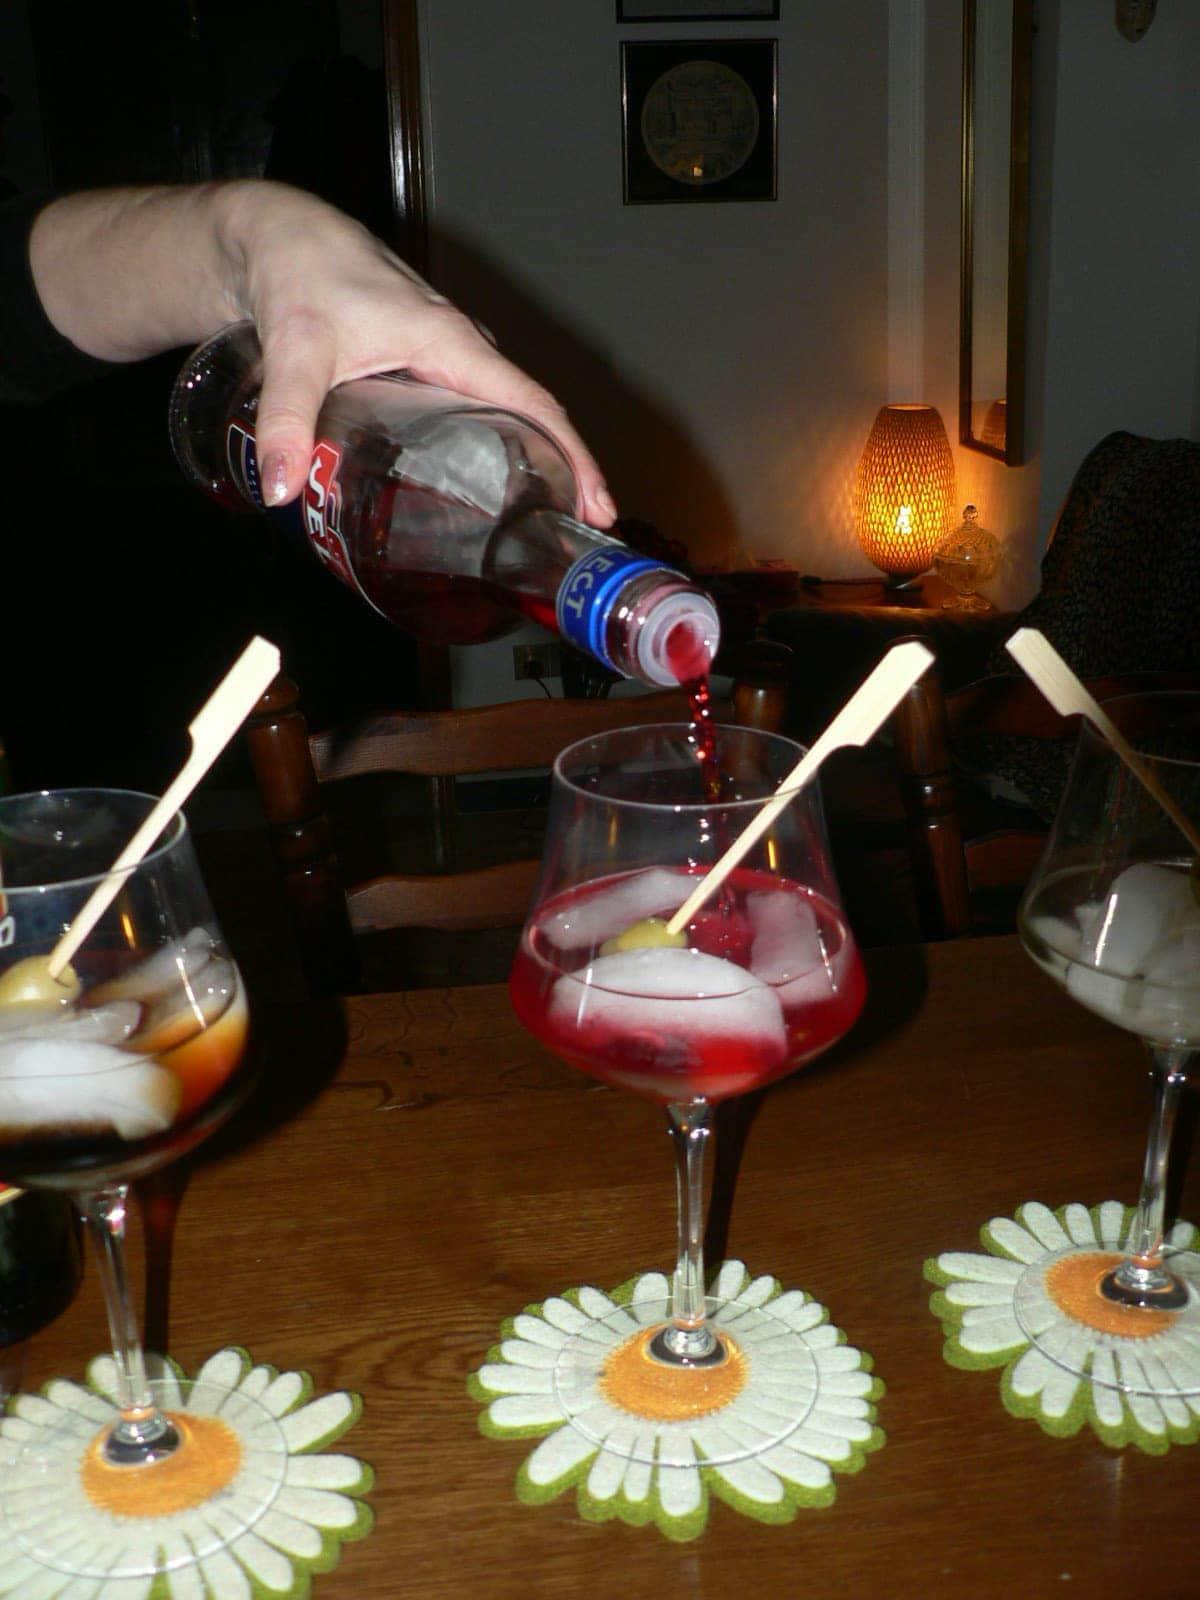 verre de vin blanc traduction italien